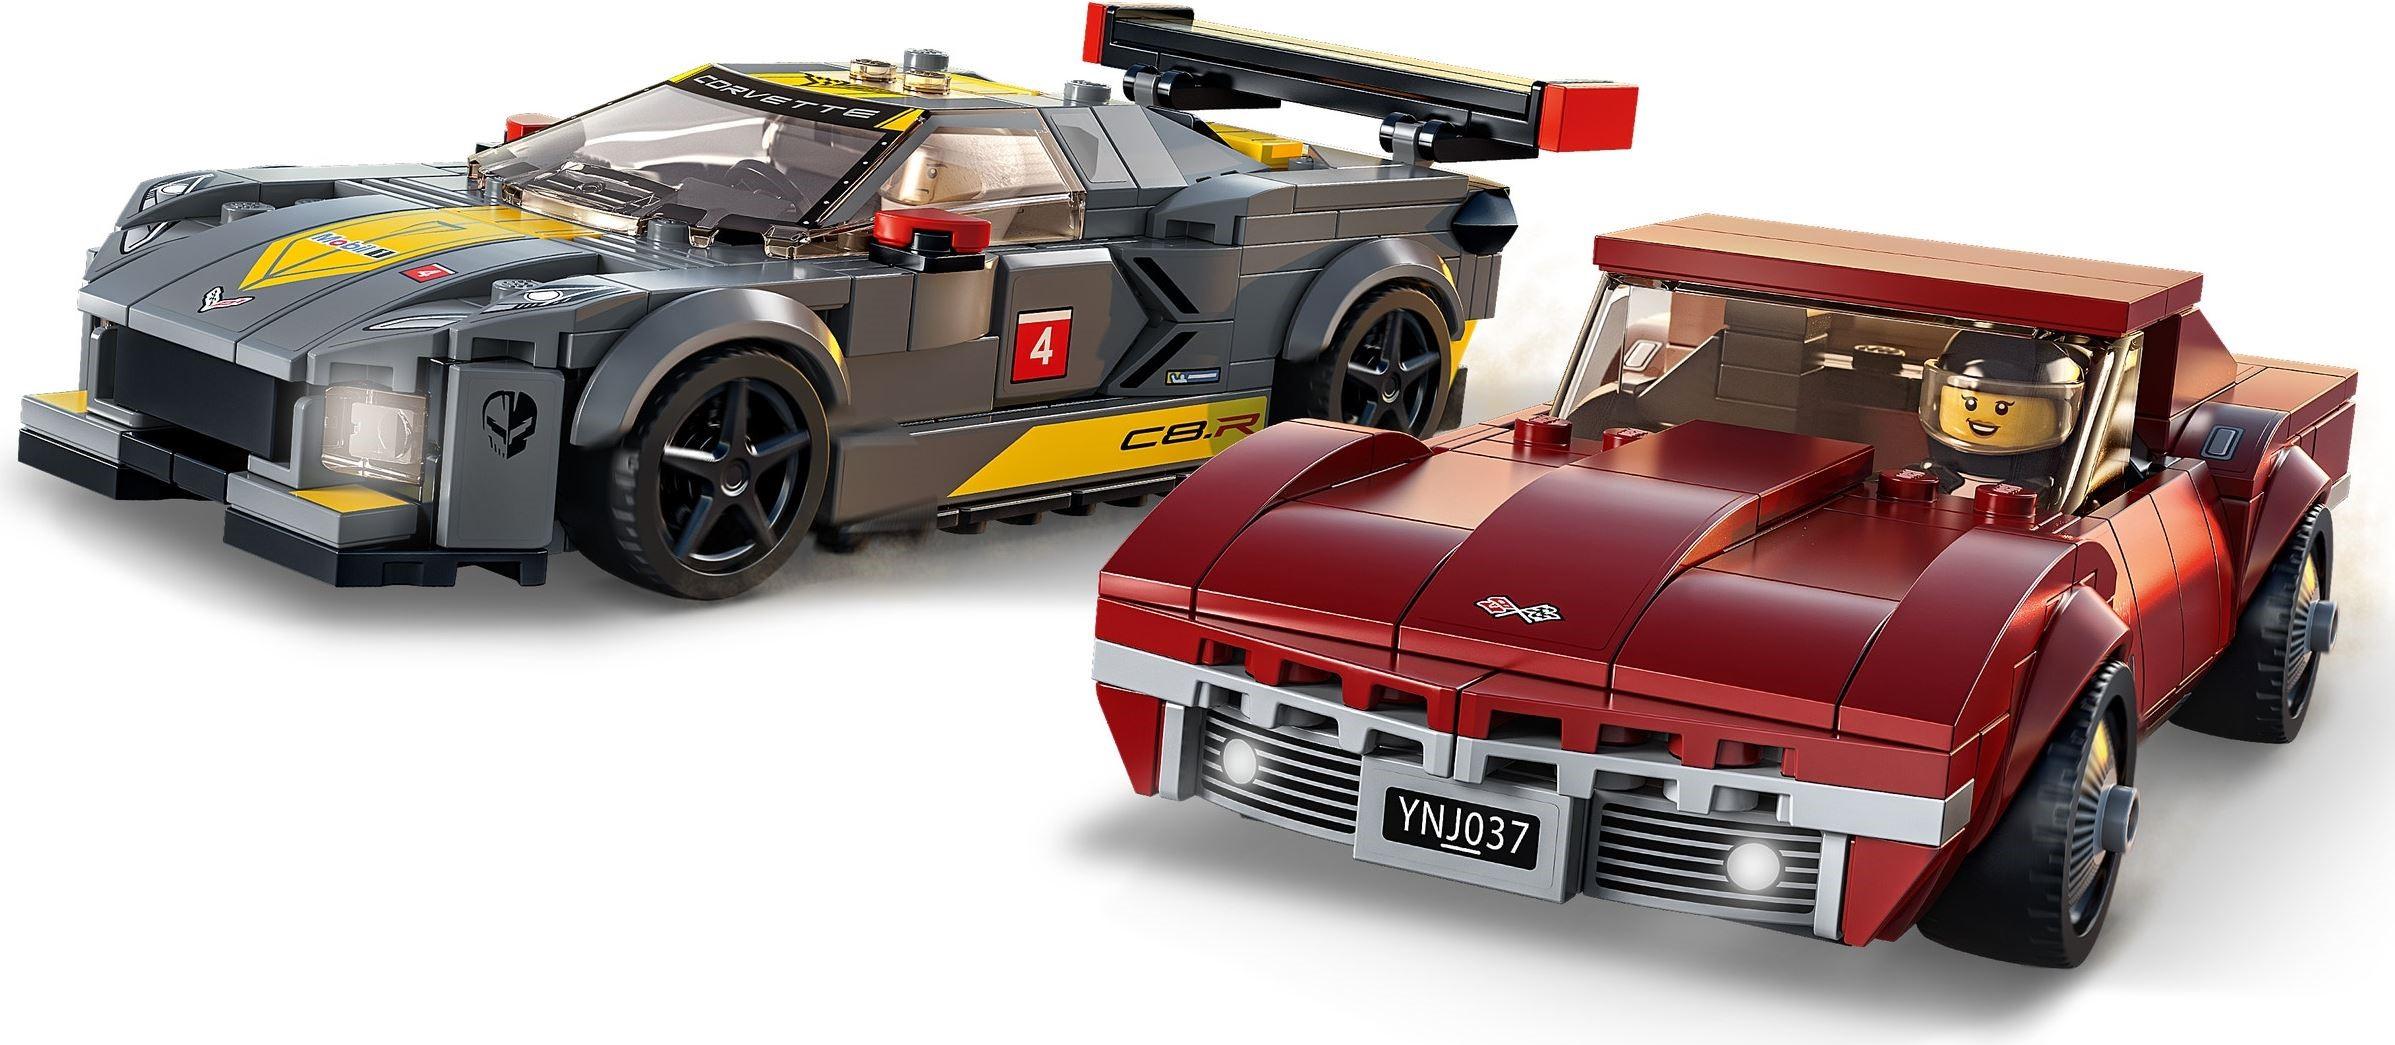 76903 LEGO Speed Champions Chevrolet Corvette C8.R Race Car and 1968 Chevrolet Corvette